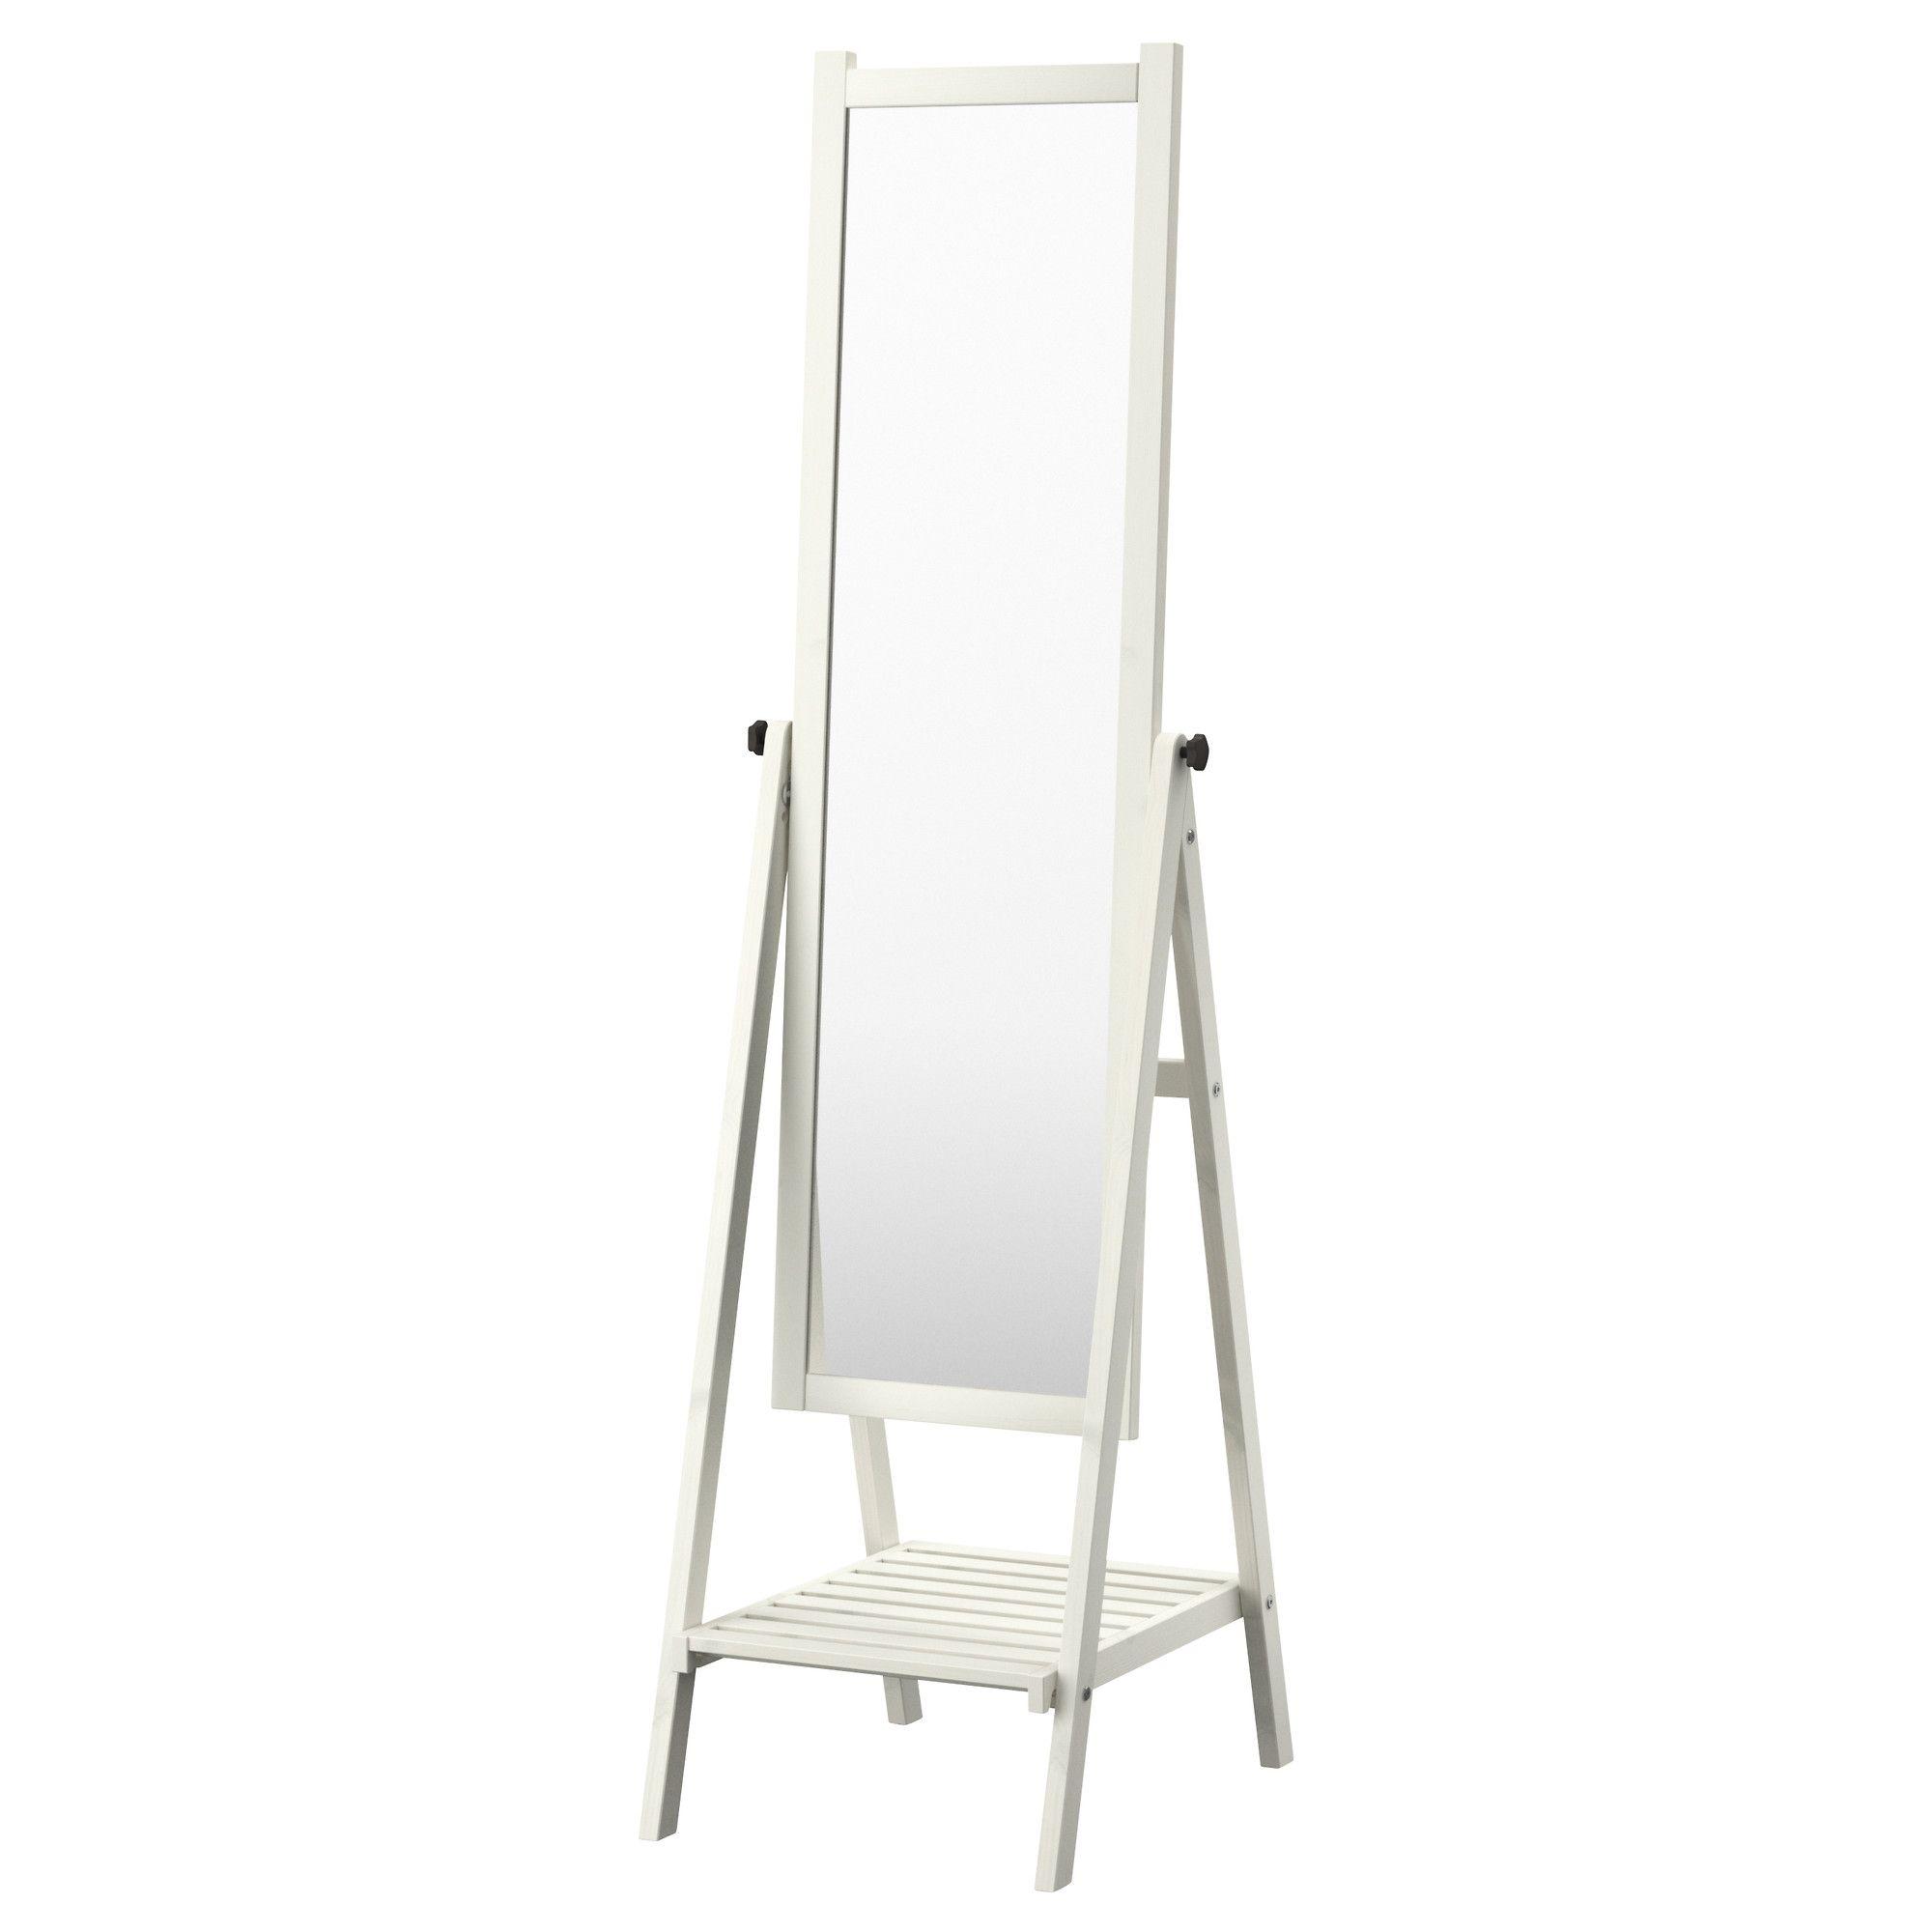 Ikea Oficialnyj Internet Magazin Mebeli Ikea Mirror Ikea Bathroom Mirror Ikea